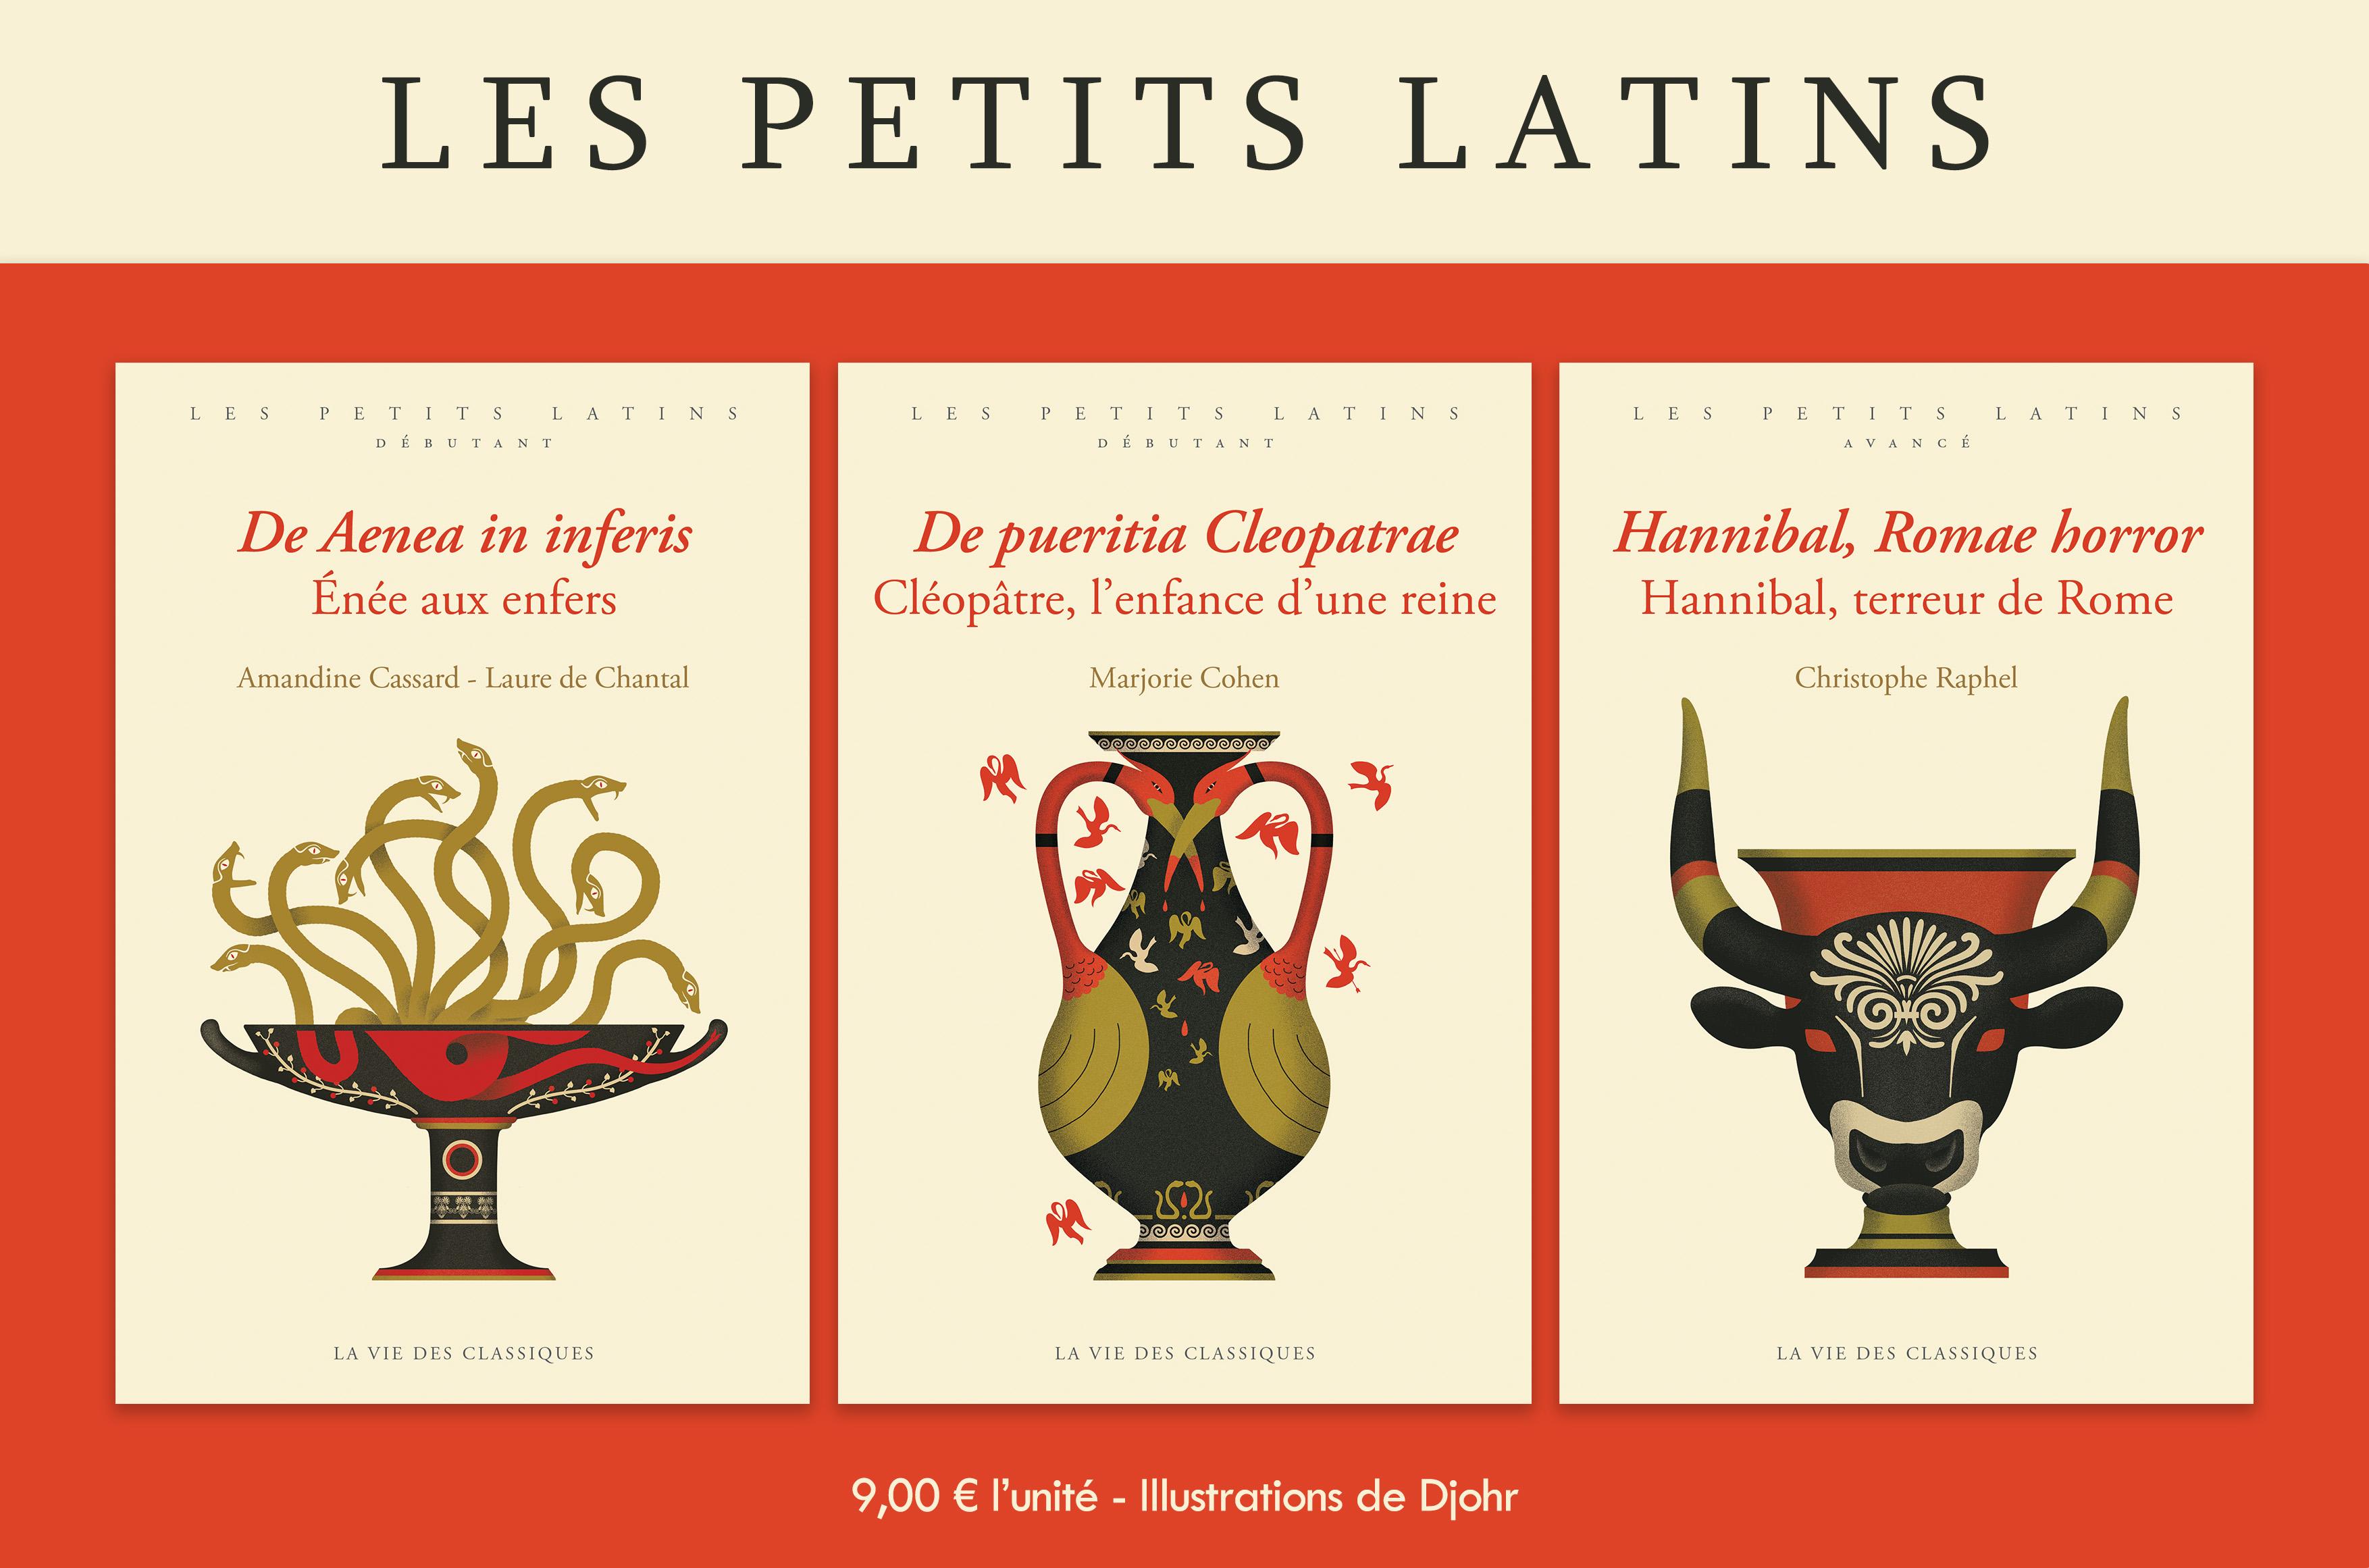 Les petits latins